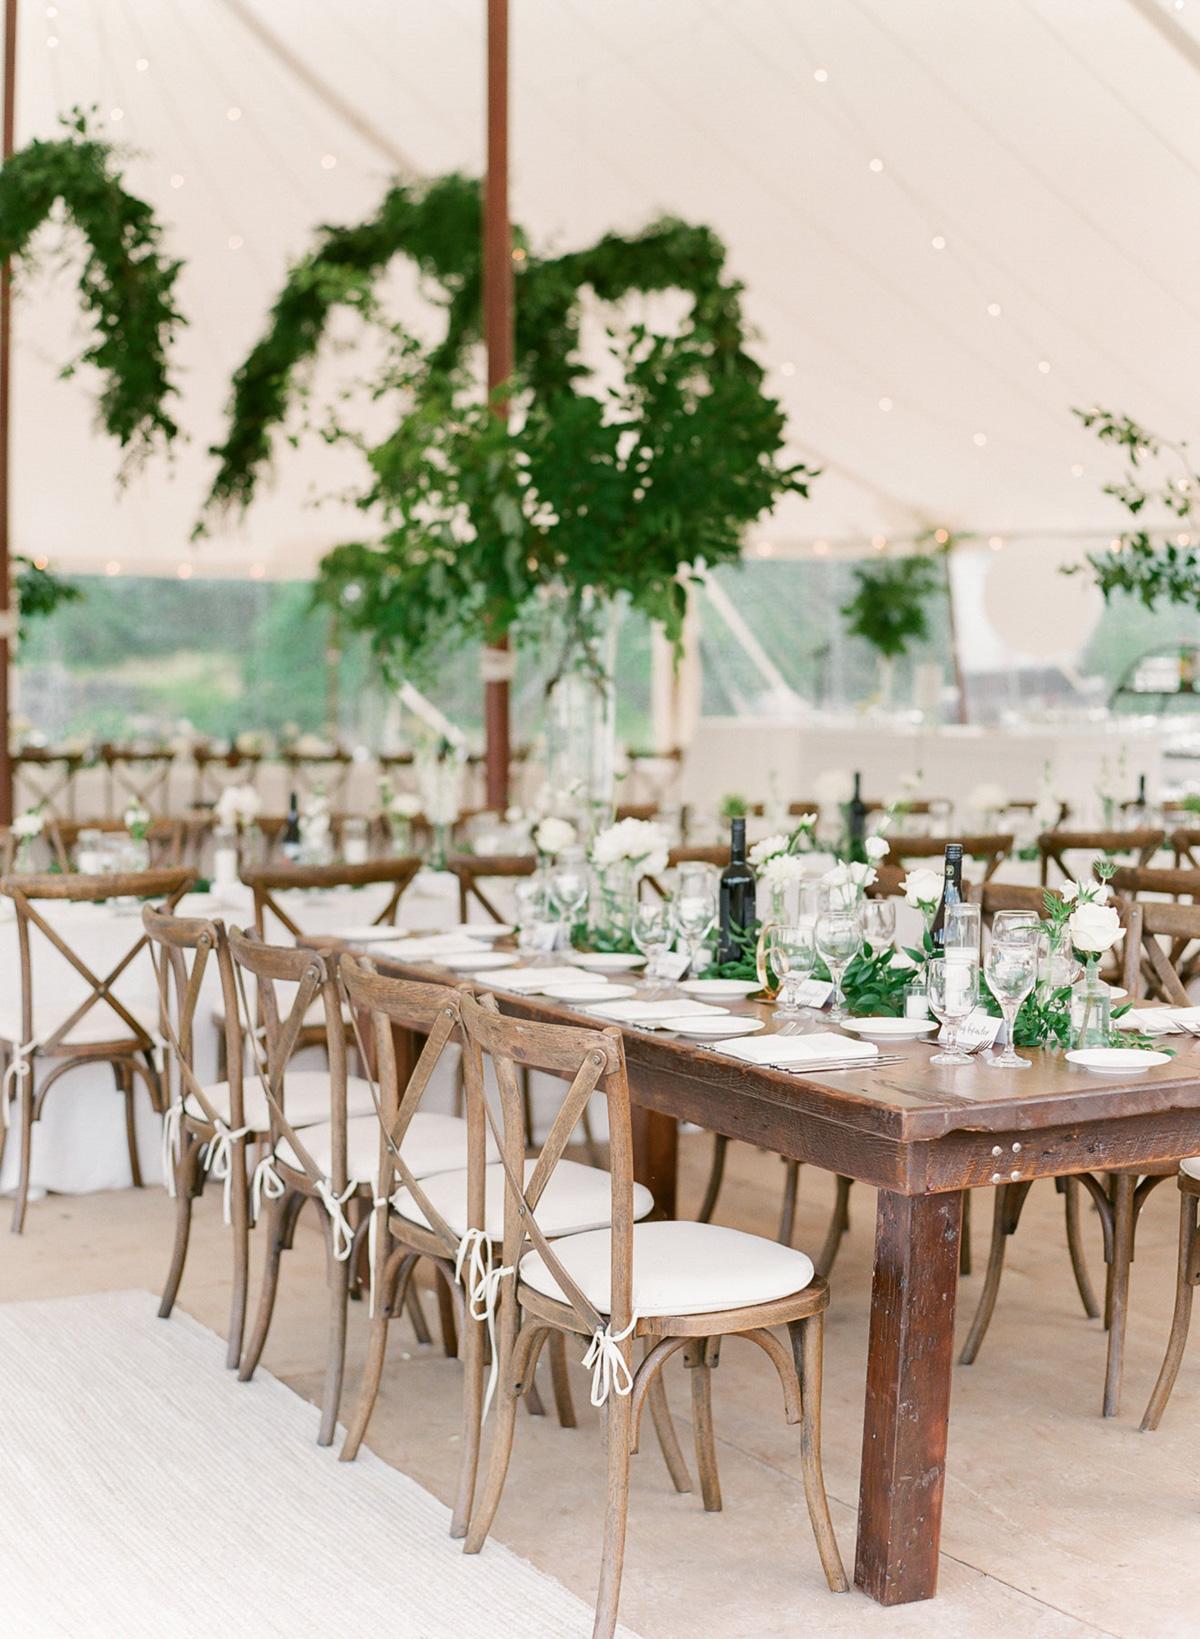 artiese-studios-vineyard-bride-swish-list-private-estate-cambridge-wedding-49.jpg